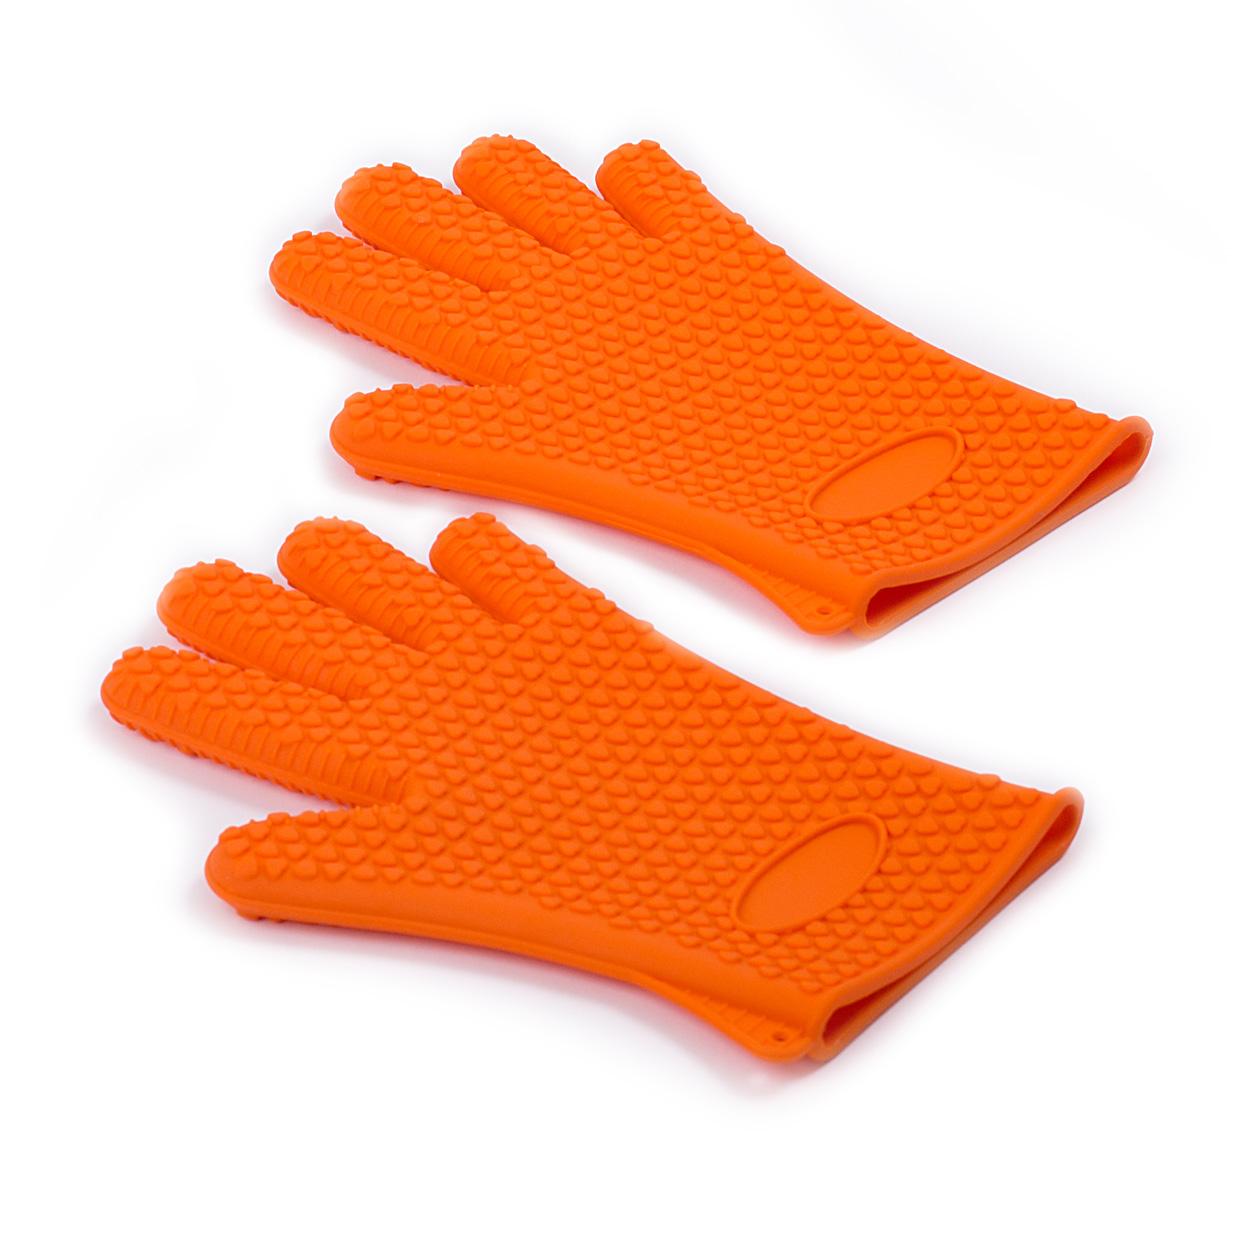 Durable Kitchen Silicone Glove Silicone Best Free